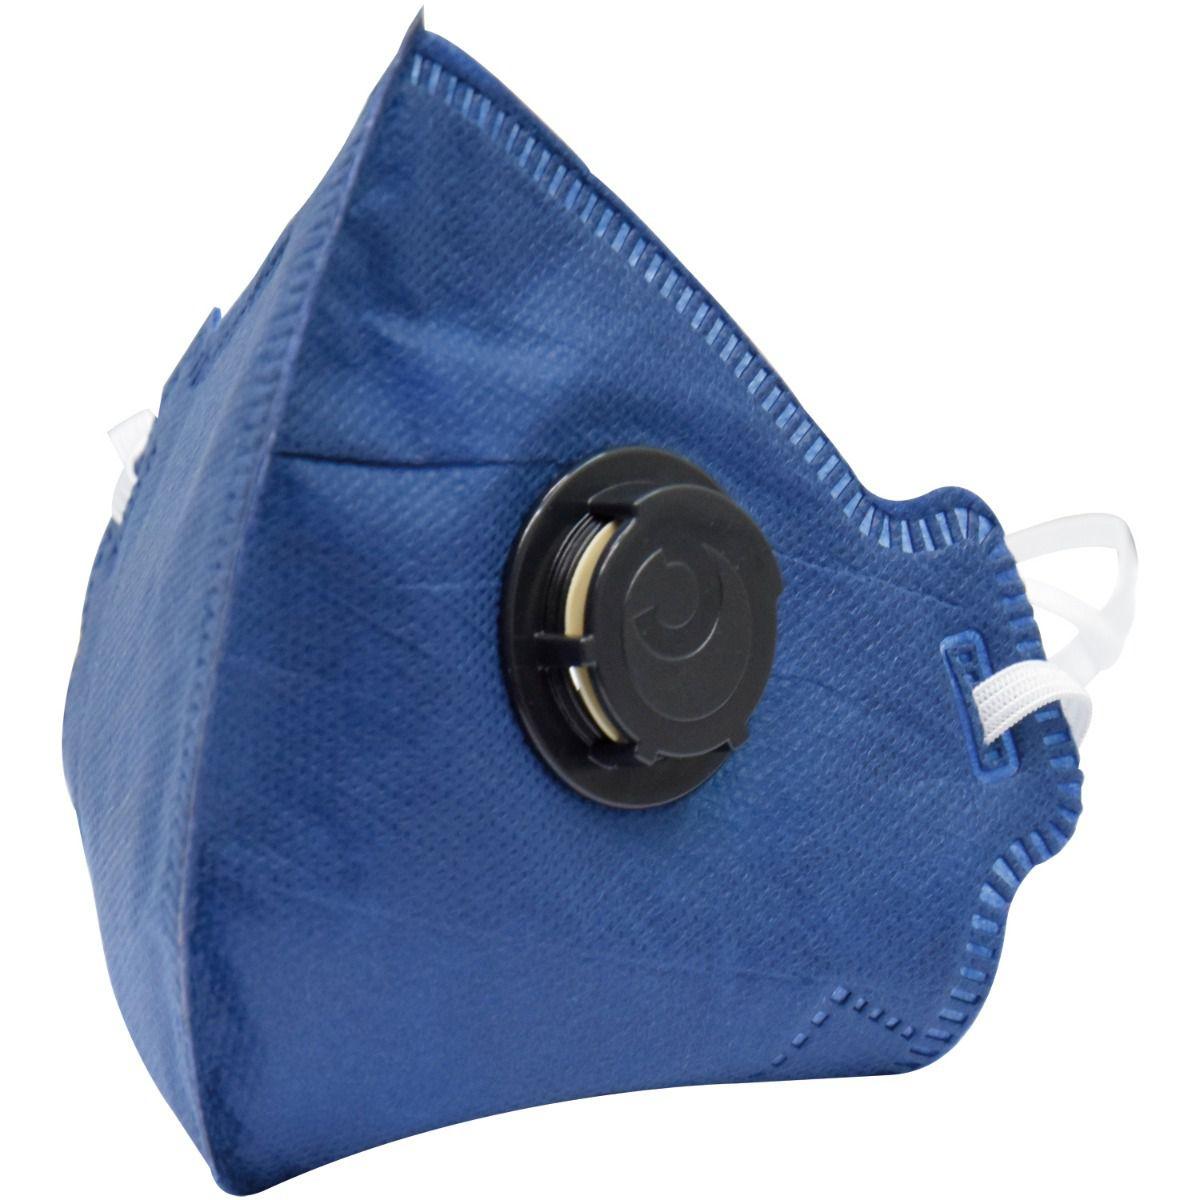 Respirador Descartável Camper Pff2 Com Válvula - 20 Unid.